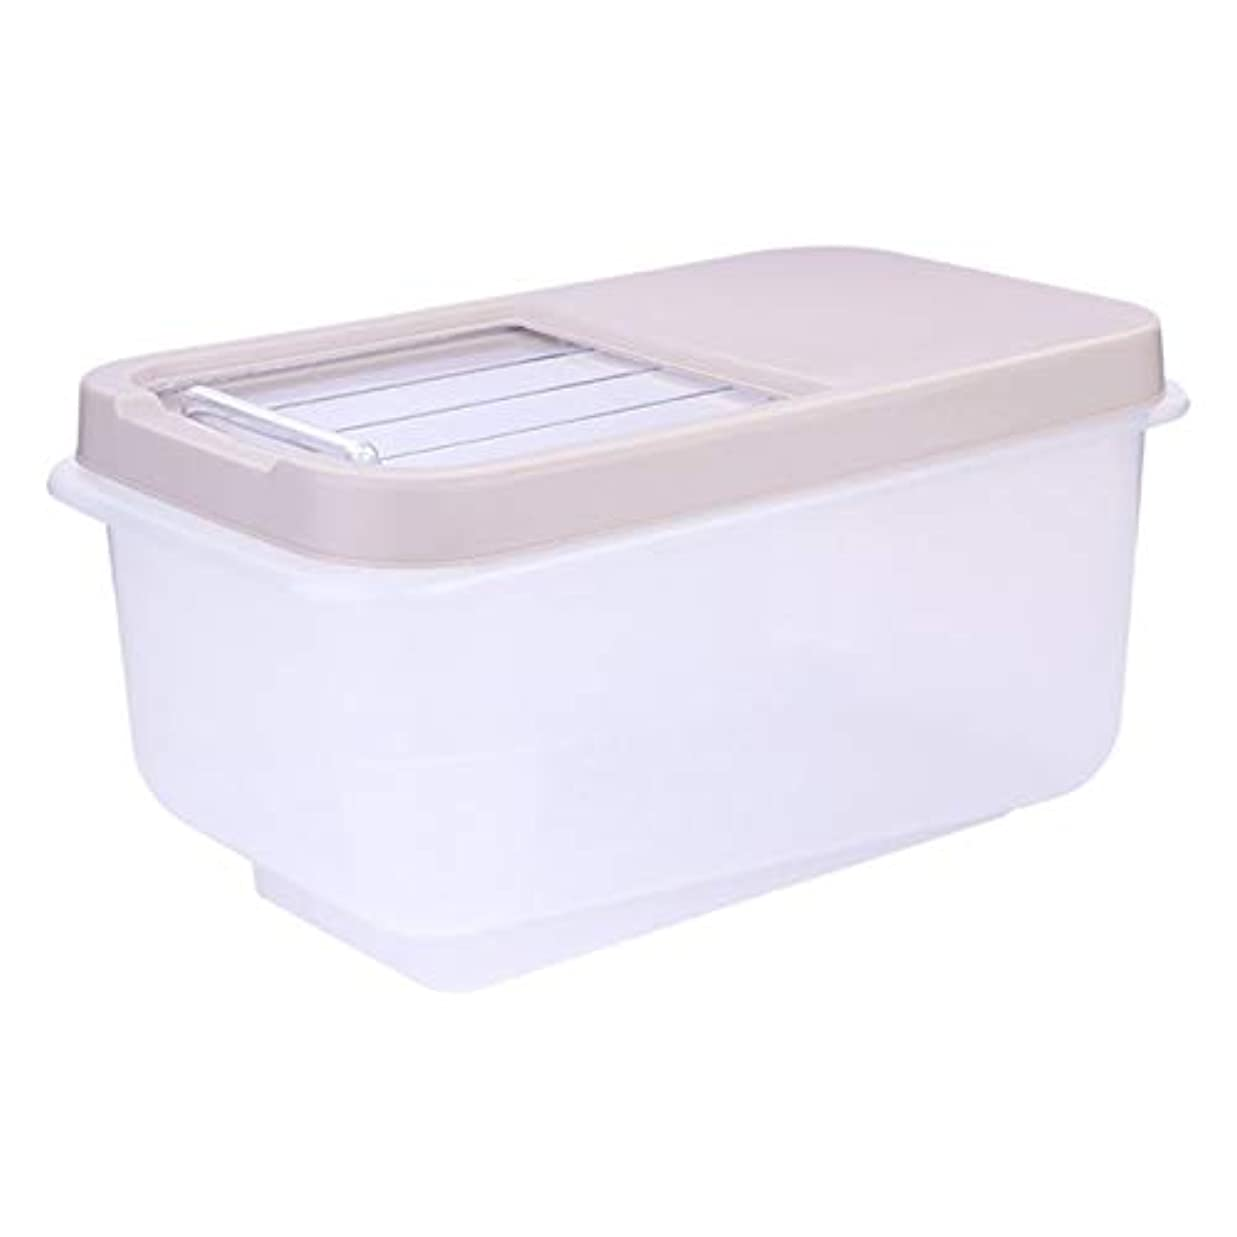 Saikogoods 家庭の使用キッチンストレージオーガナイザーは 封印された食品のストレージを乾燥ボックス防湿ライスビン豆穀物コンテナオーガナイザー アプリコット